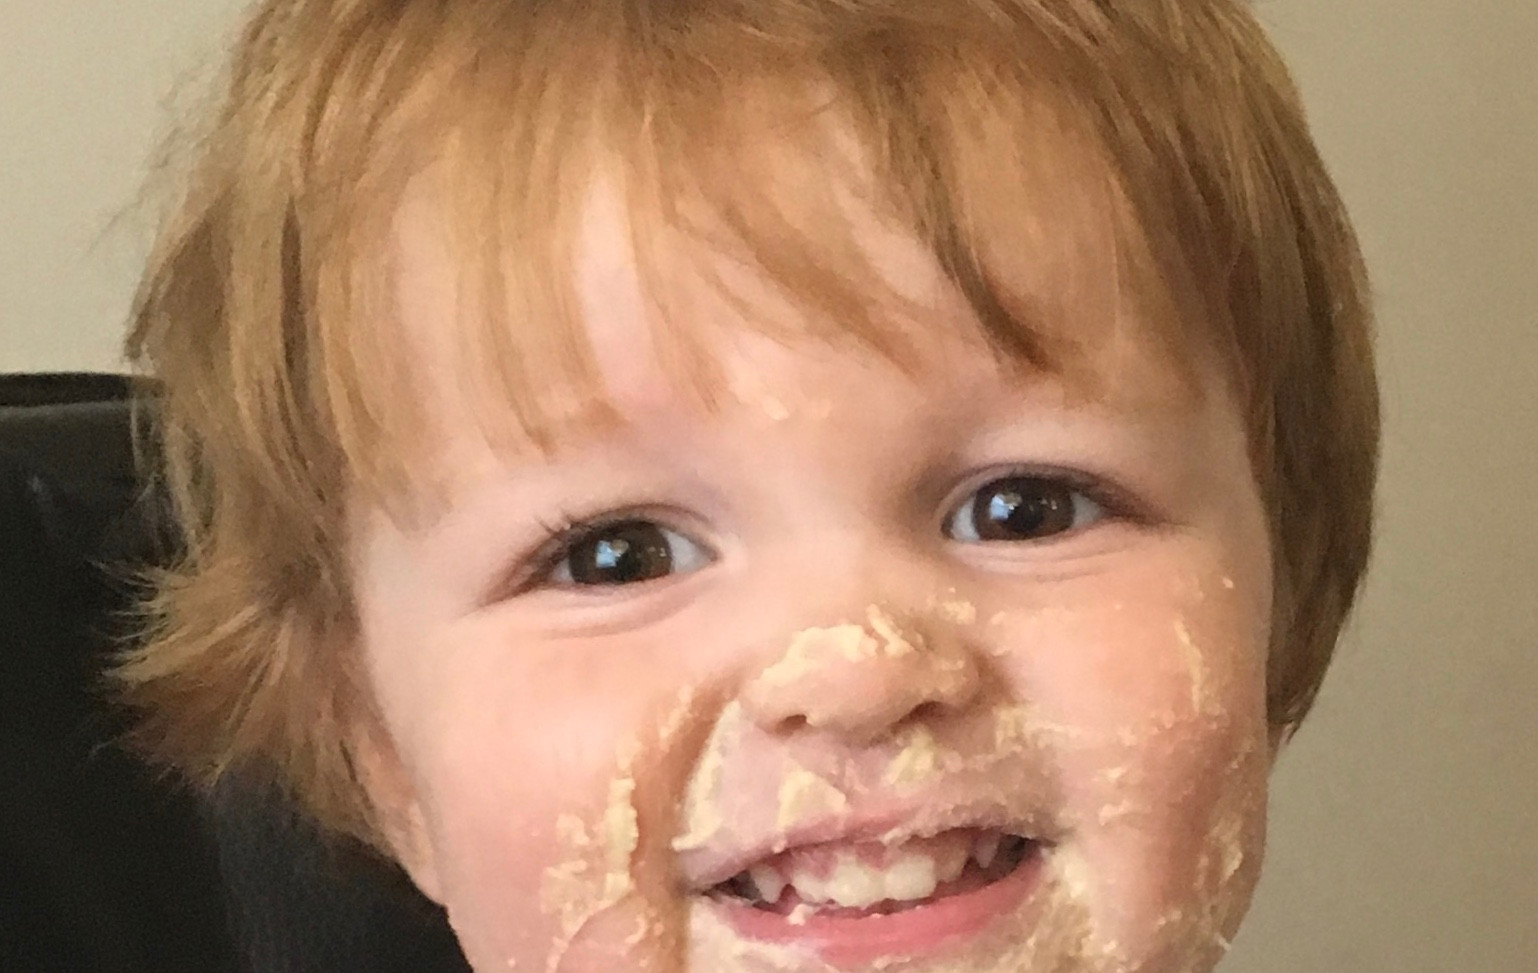 Little Frankie and Hummus